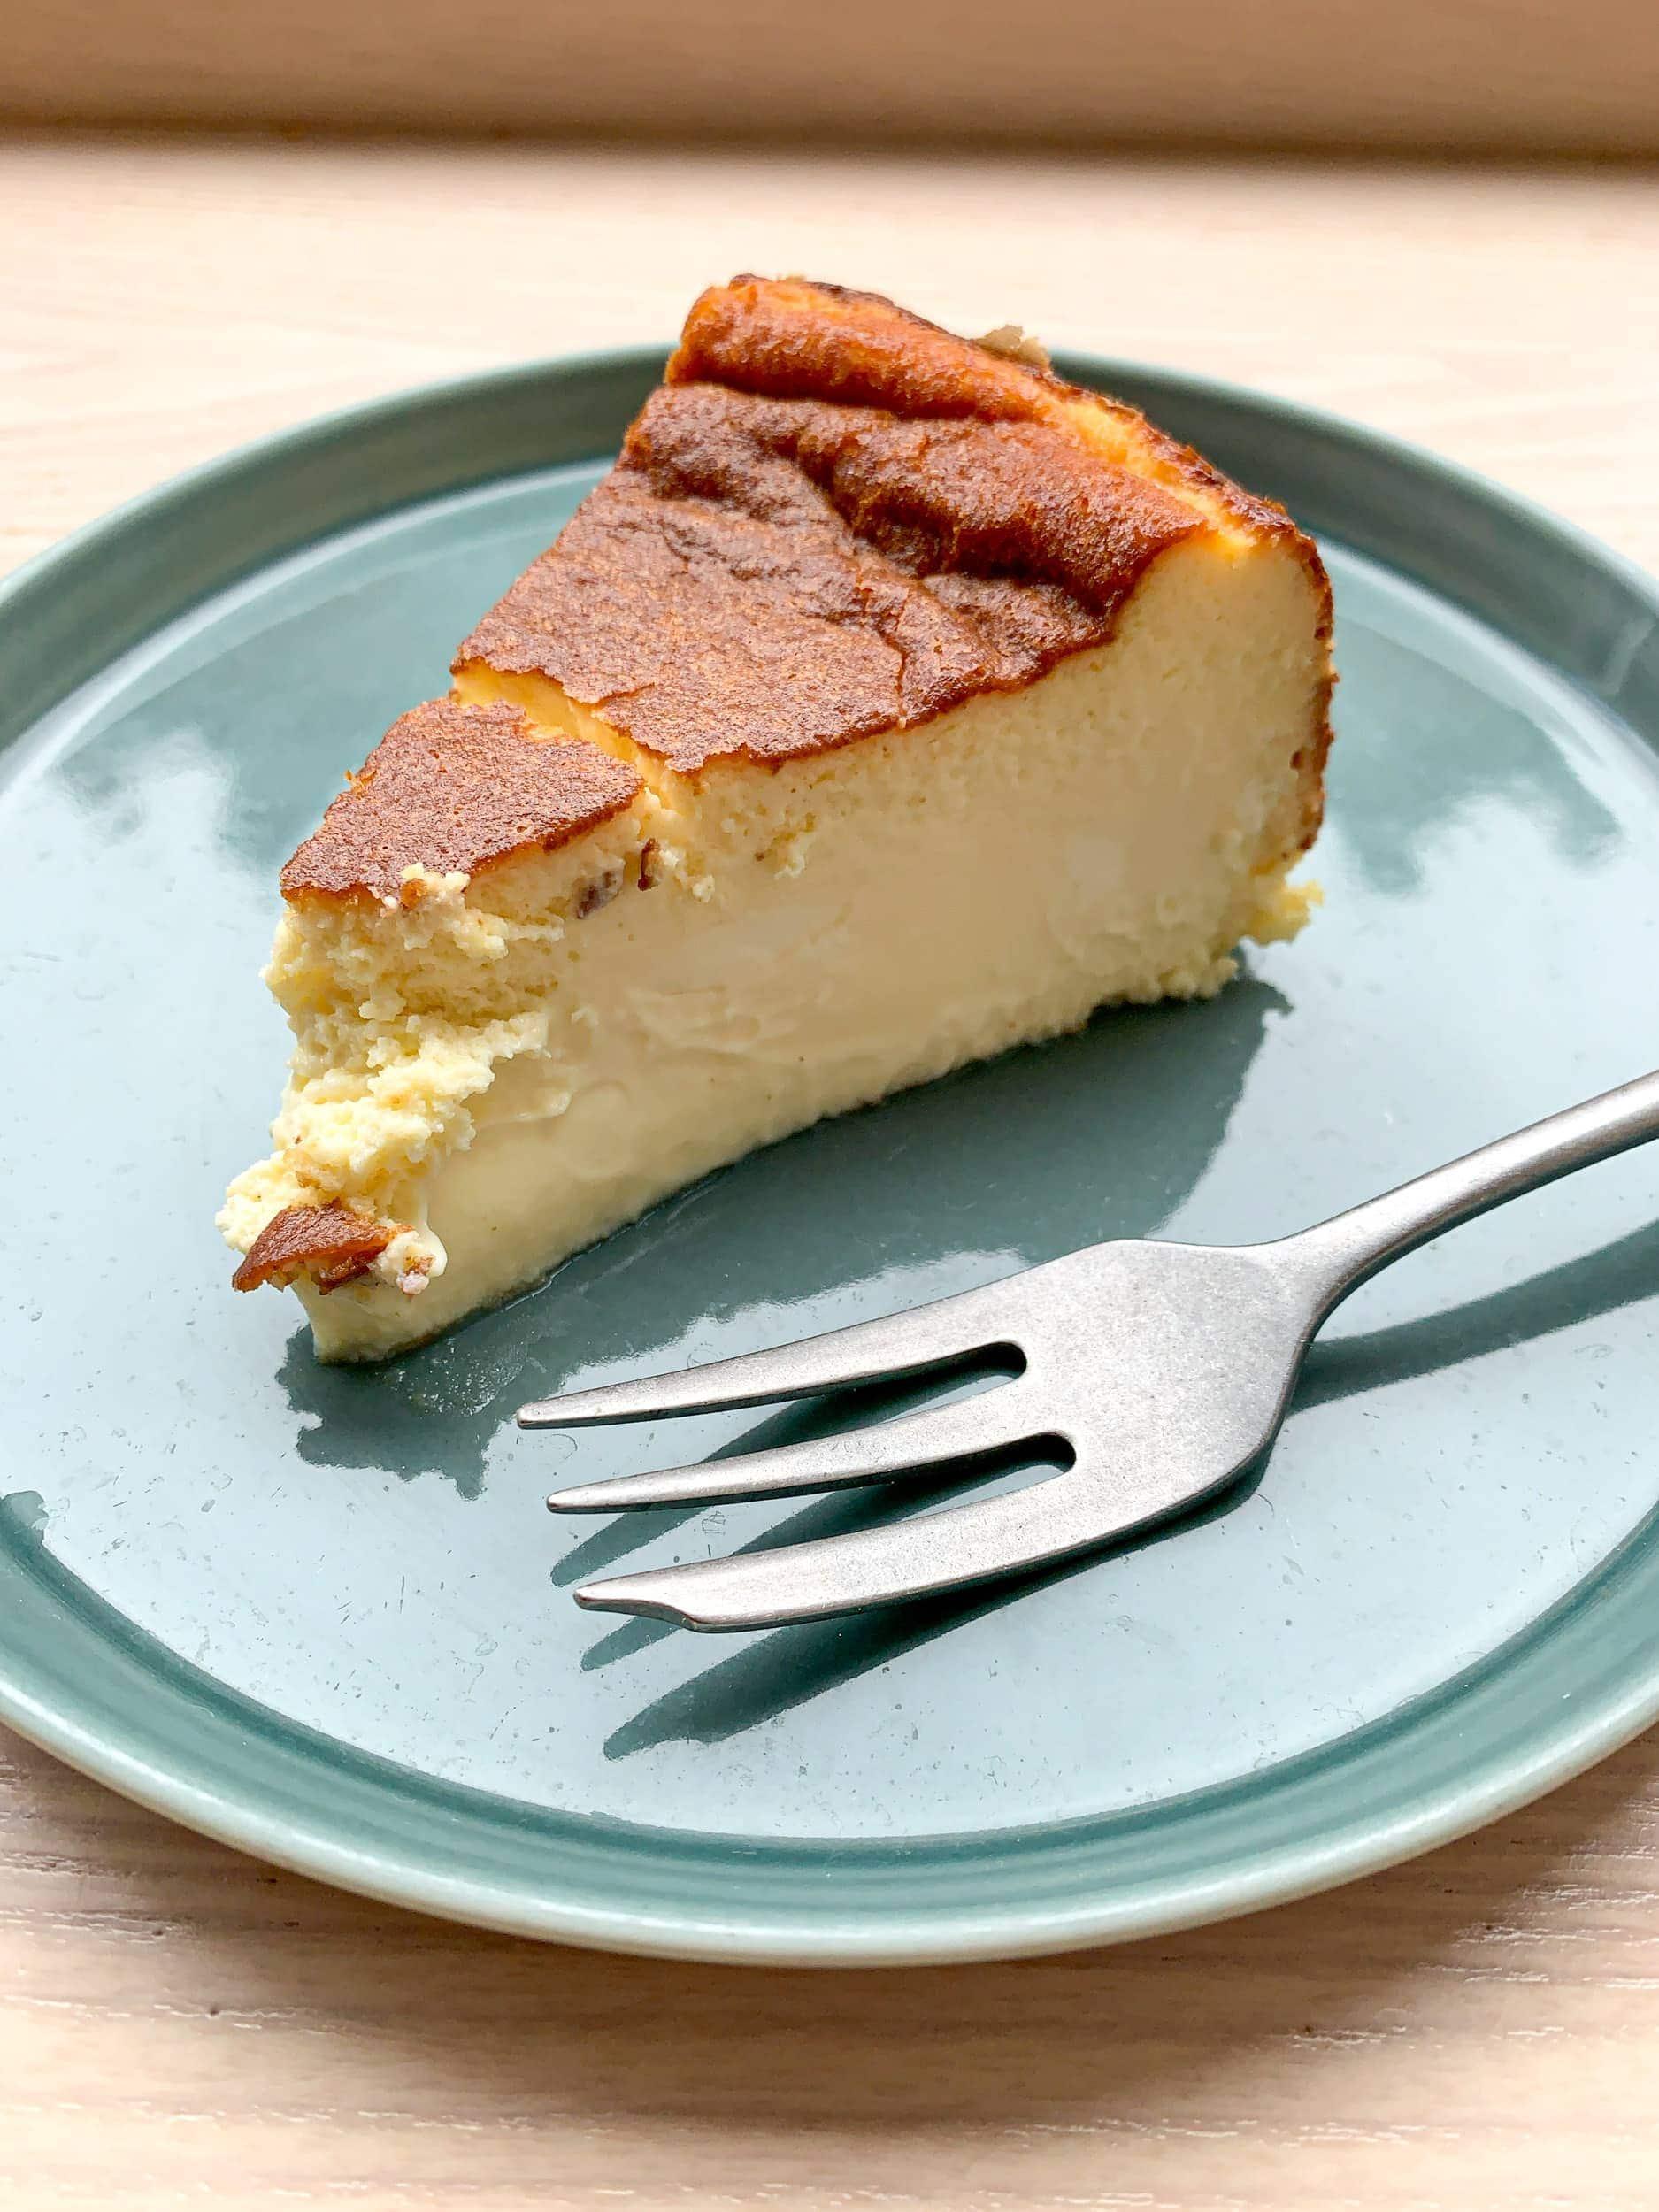 Basque cheesecake at Hart Bageri